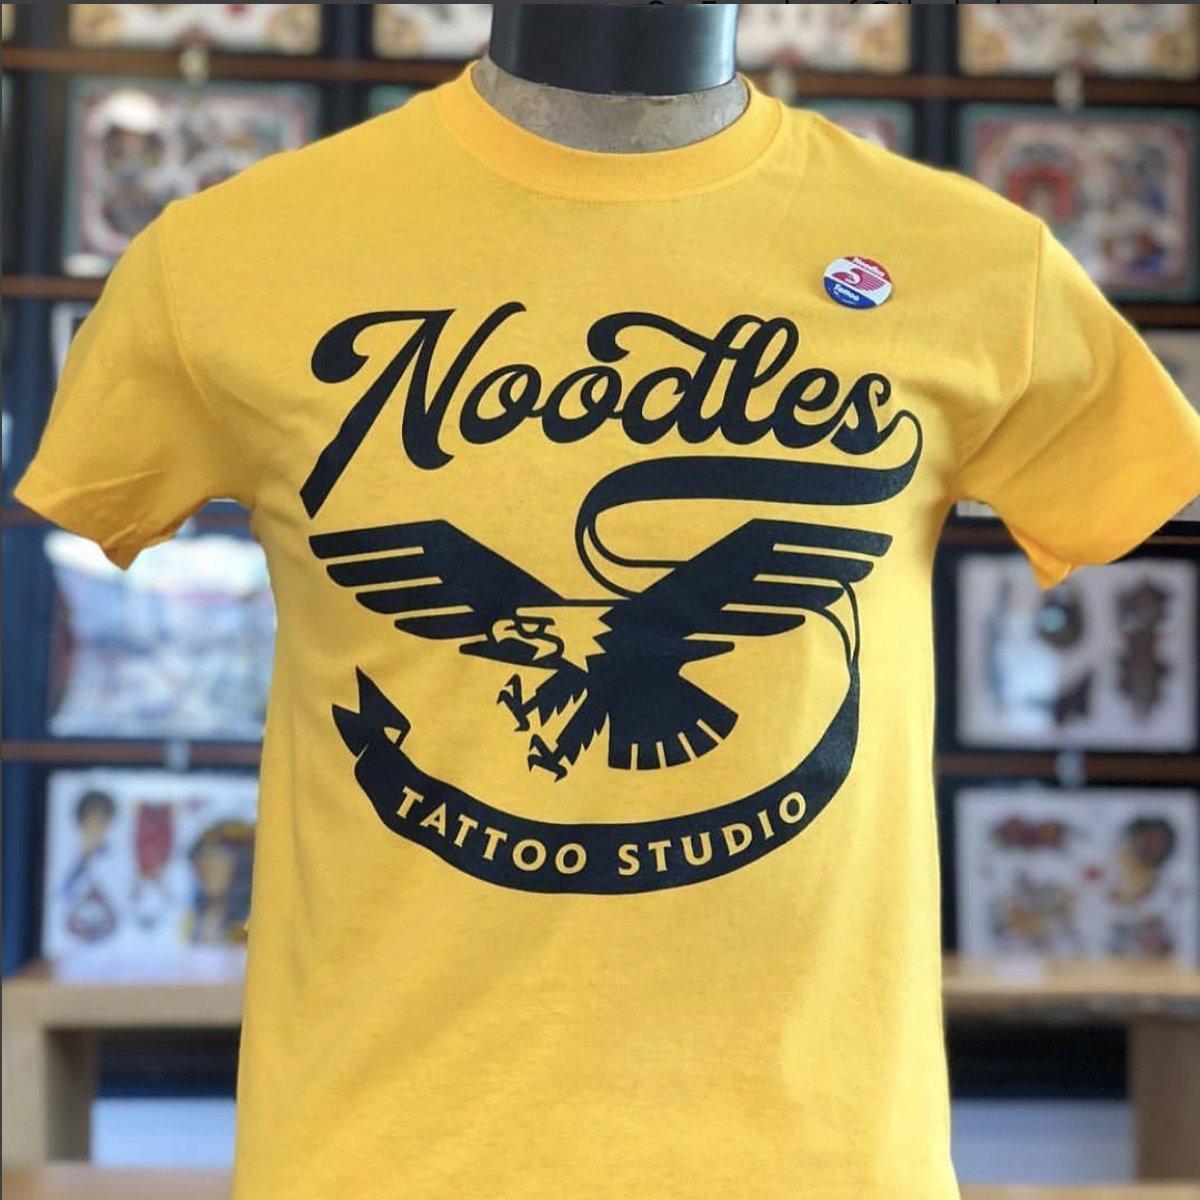 Noodles Tattoo Shirt Yellow